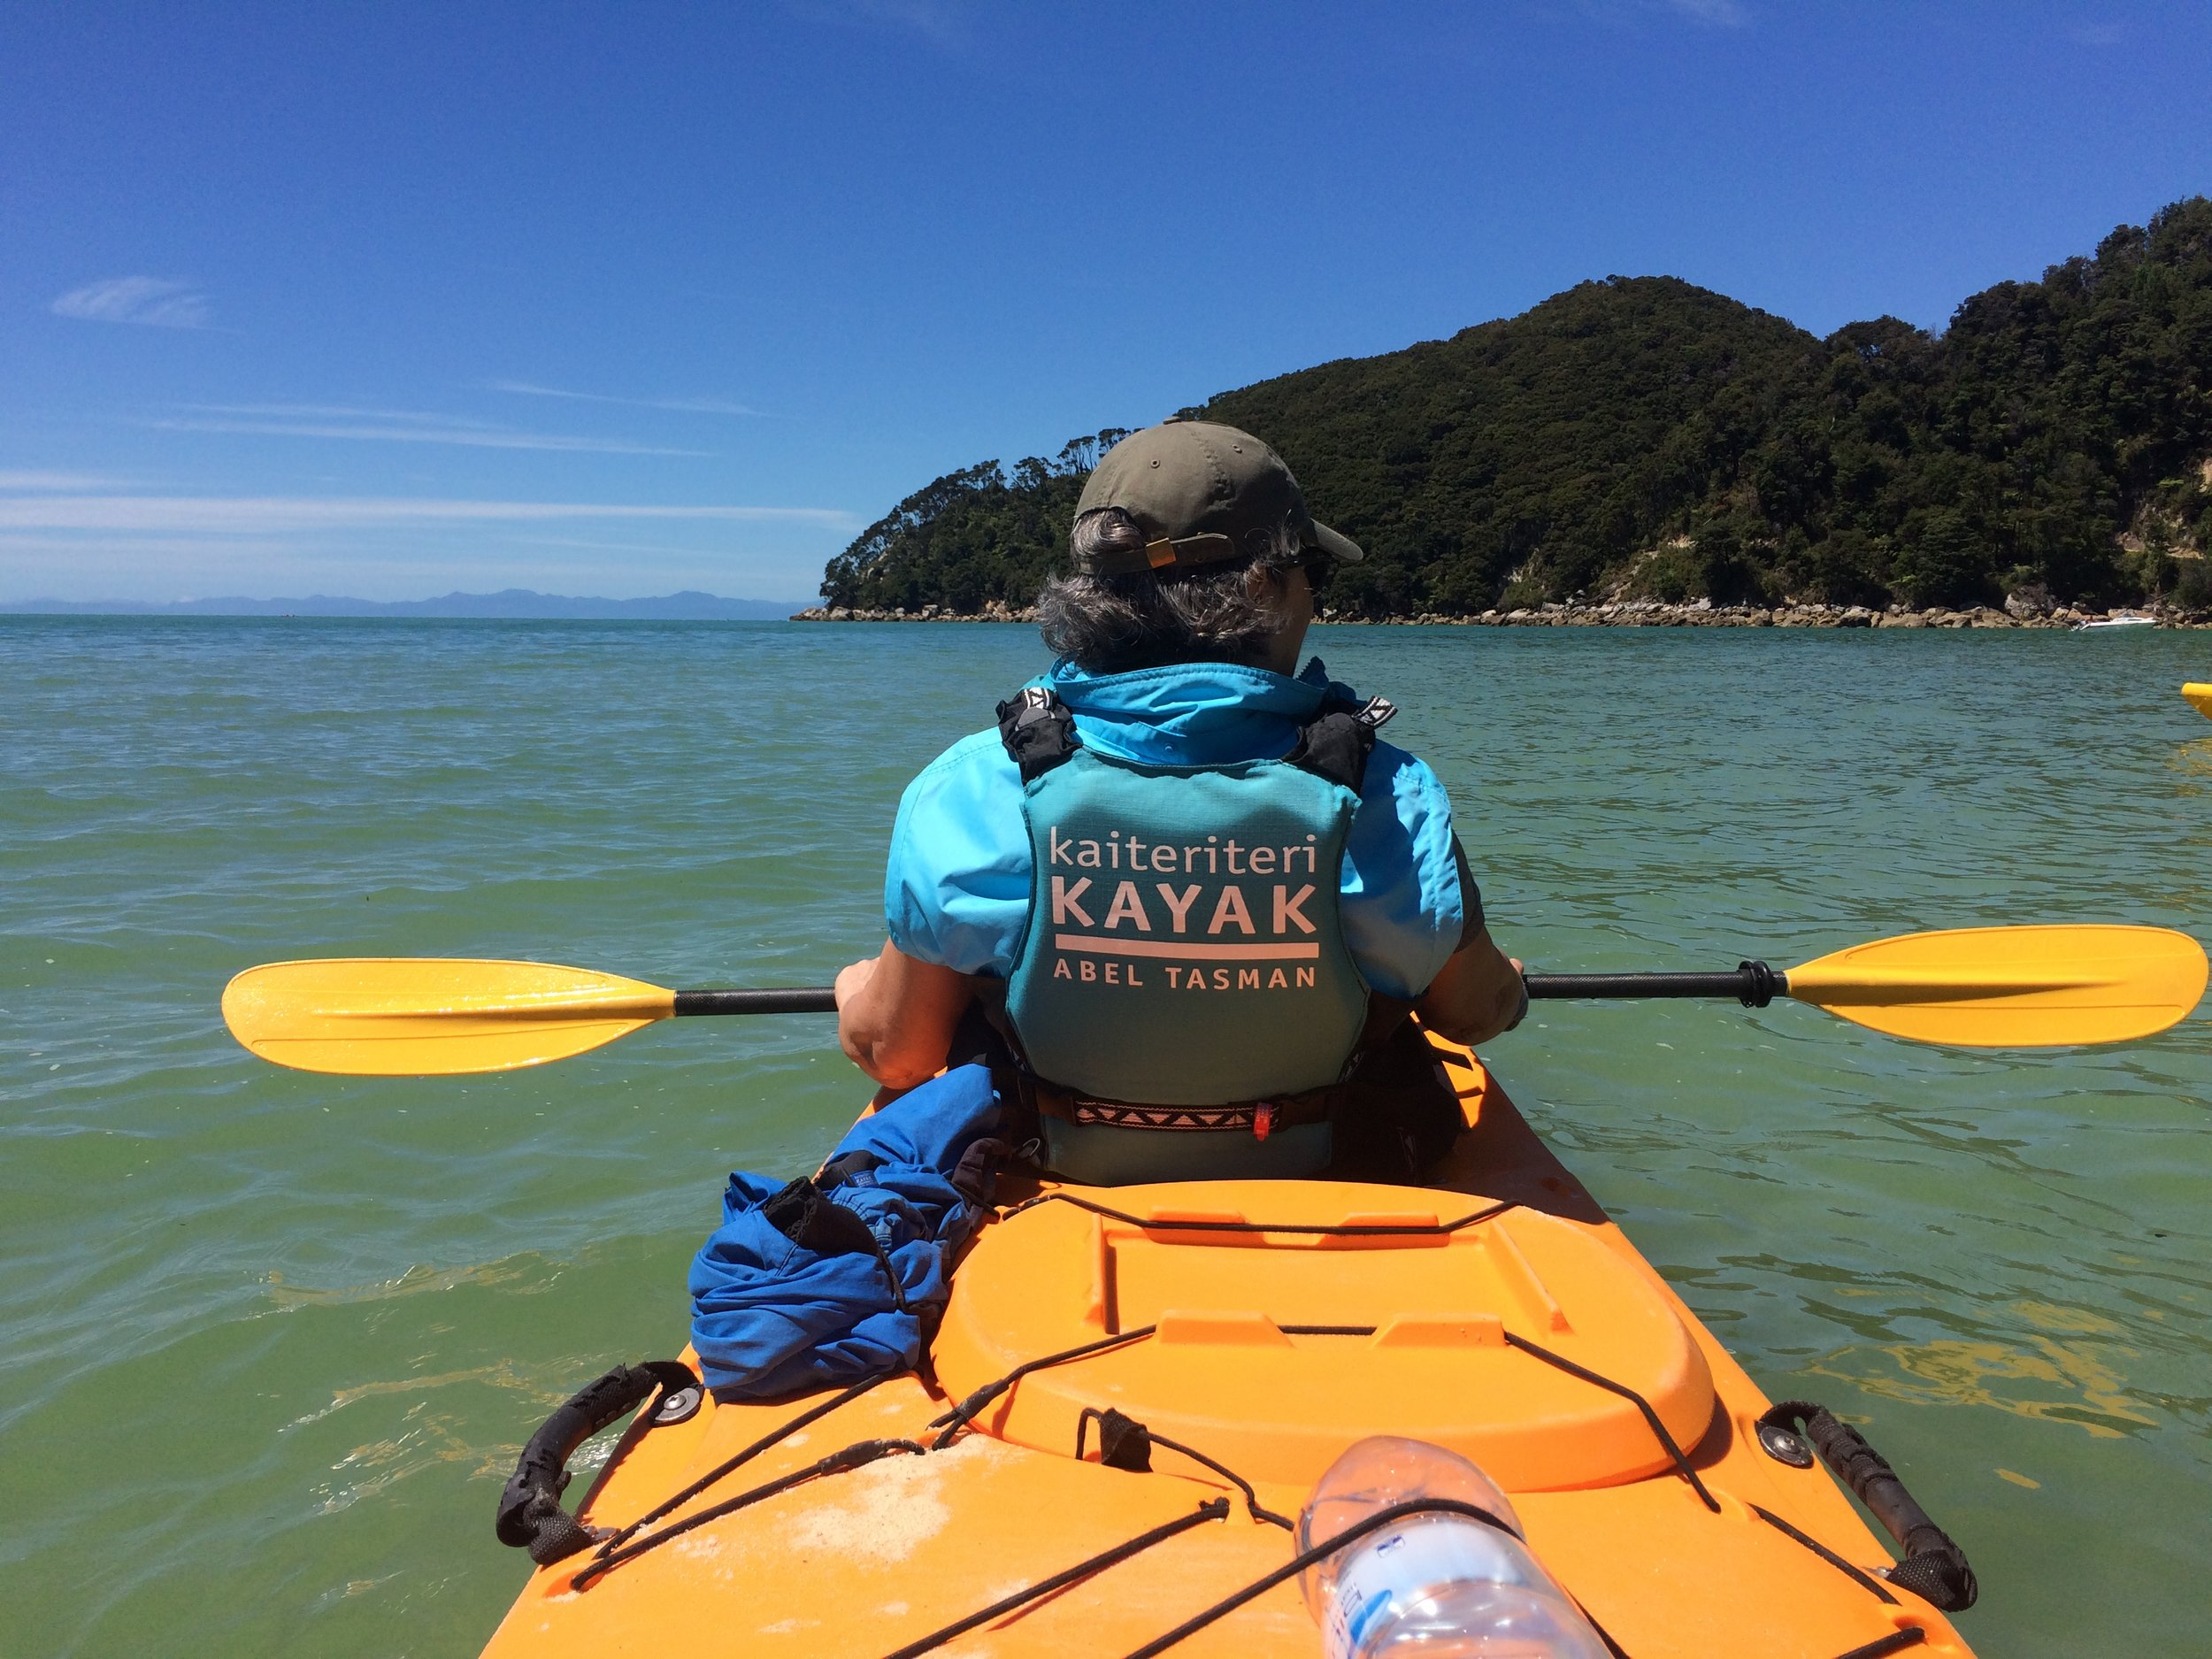 Slobodanka sea kayaking in the Abel Tasman nature reserve, New Zealand